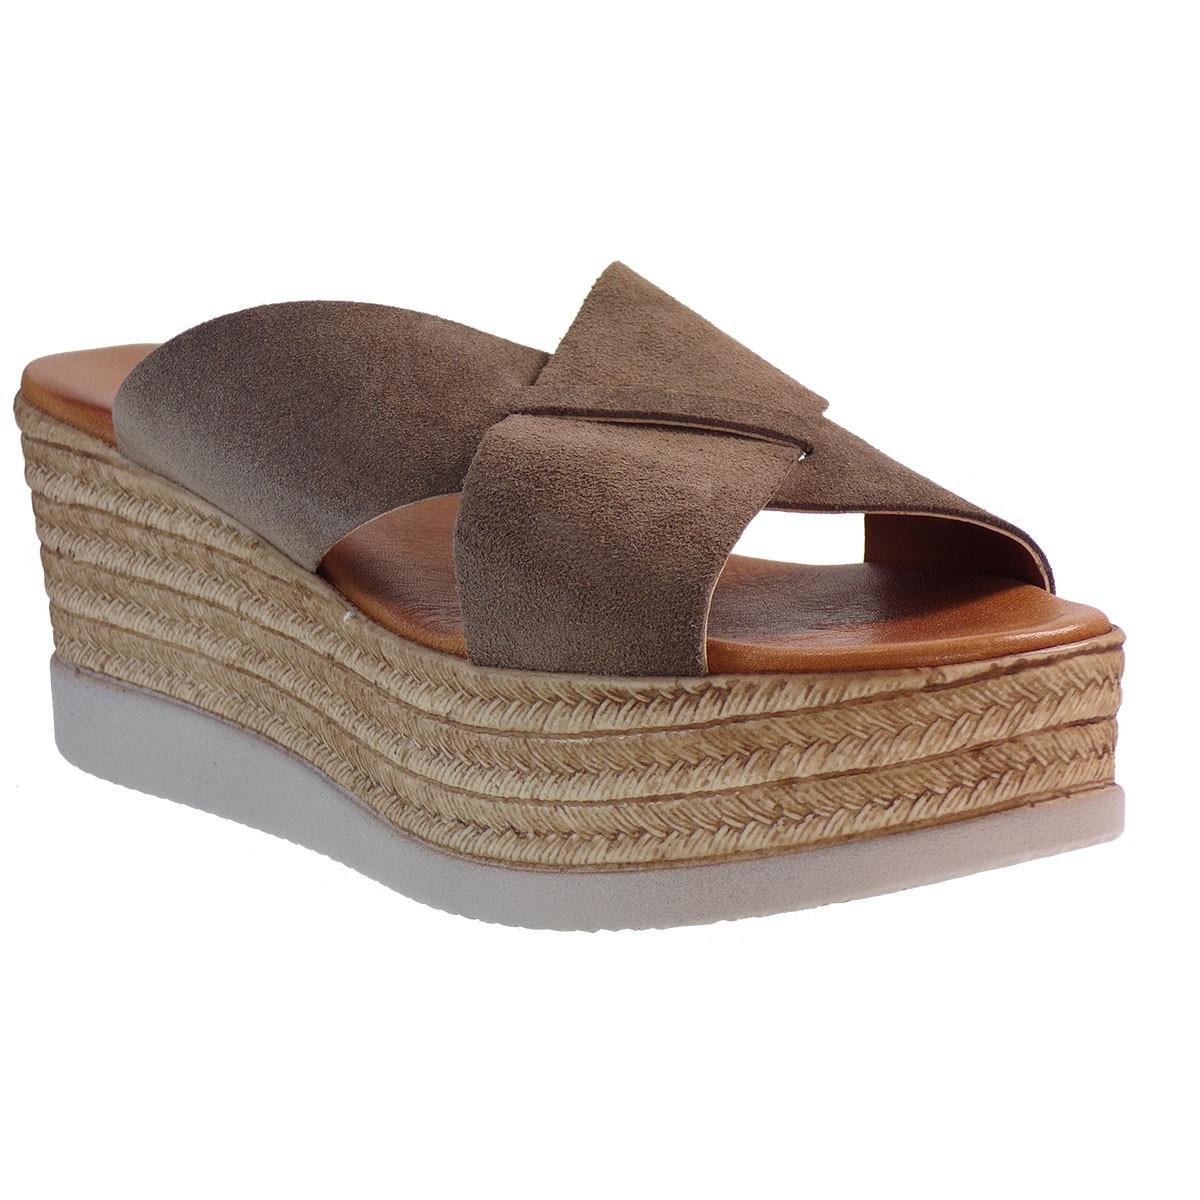 Fardoulis shoes Γυναικείες Πλατφόρμες 64447 Πούρο Καστόρι